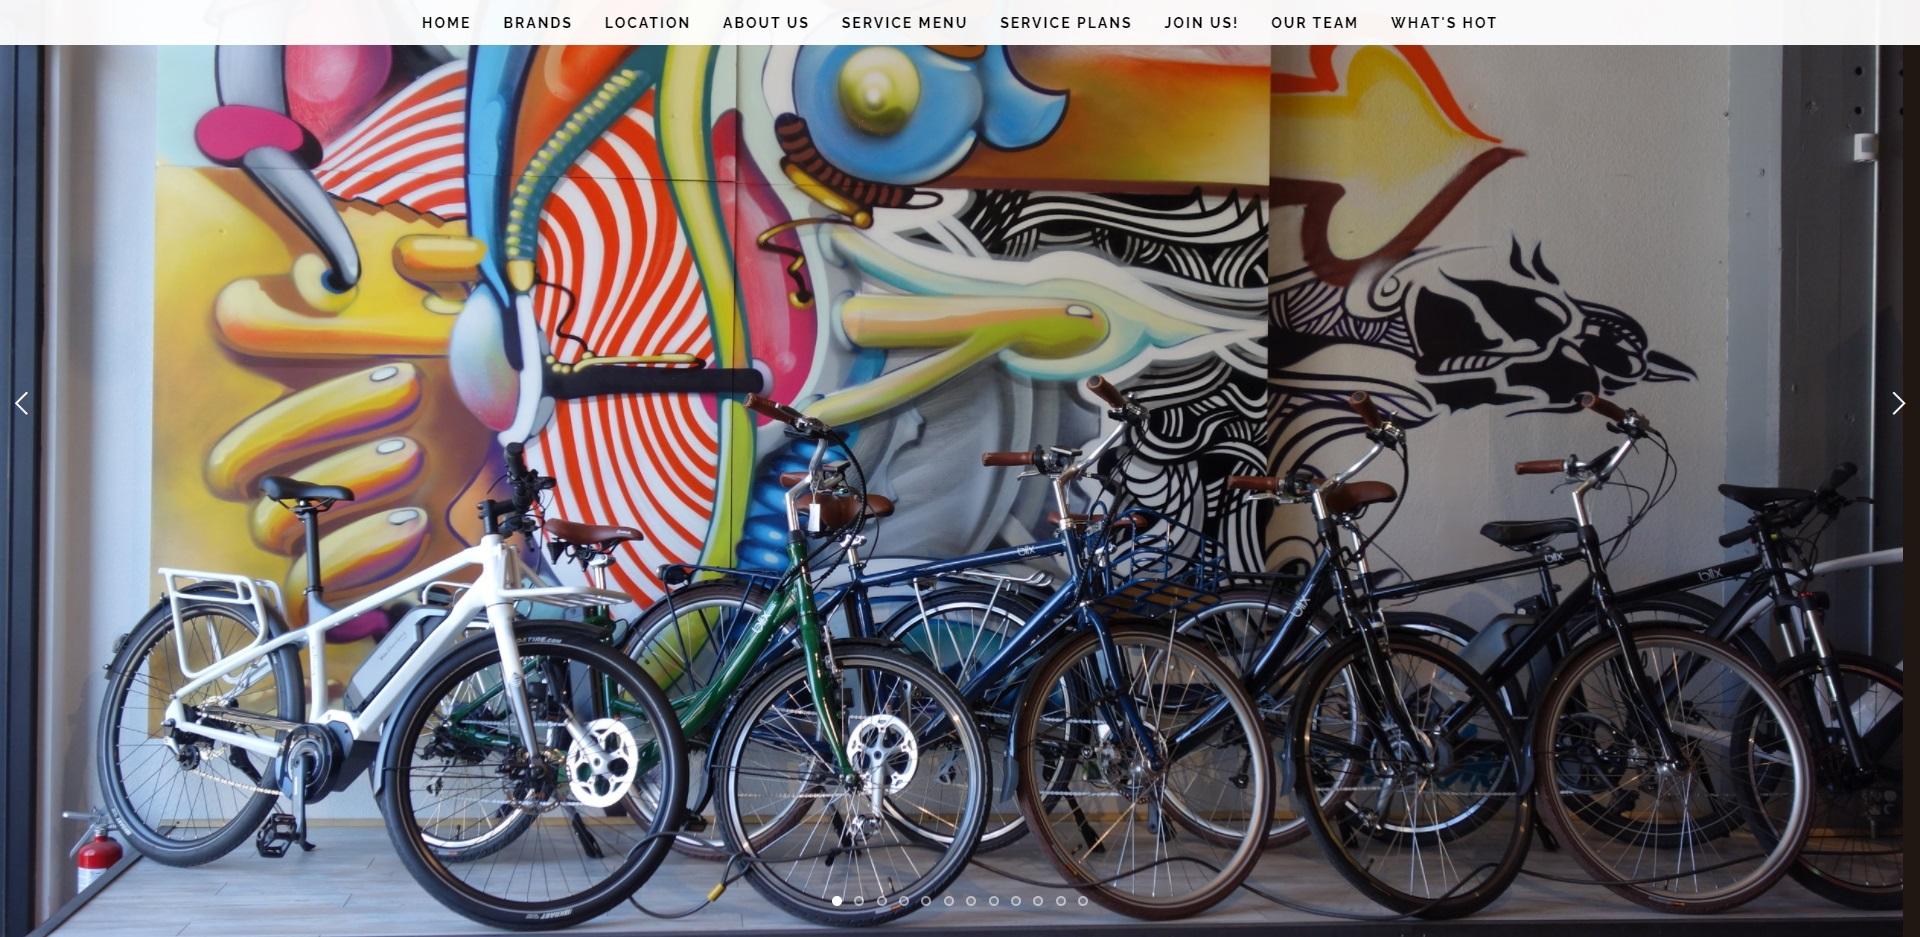 San Francisco, CA's Best Bike Shops